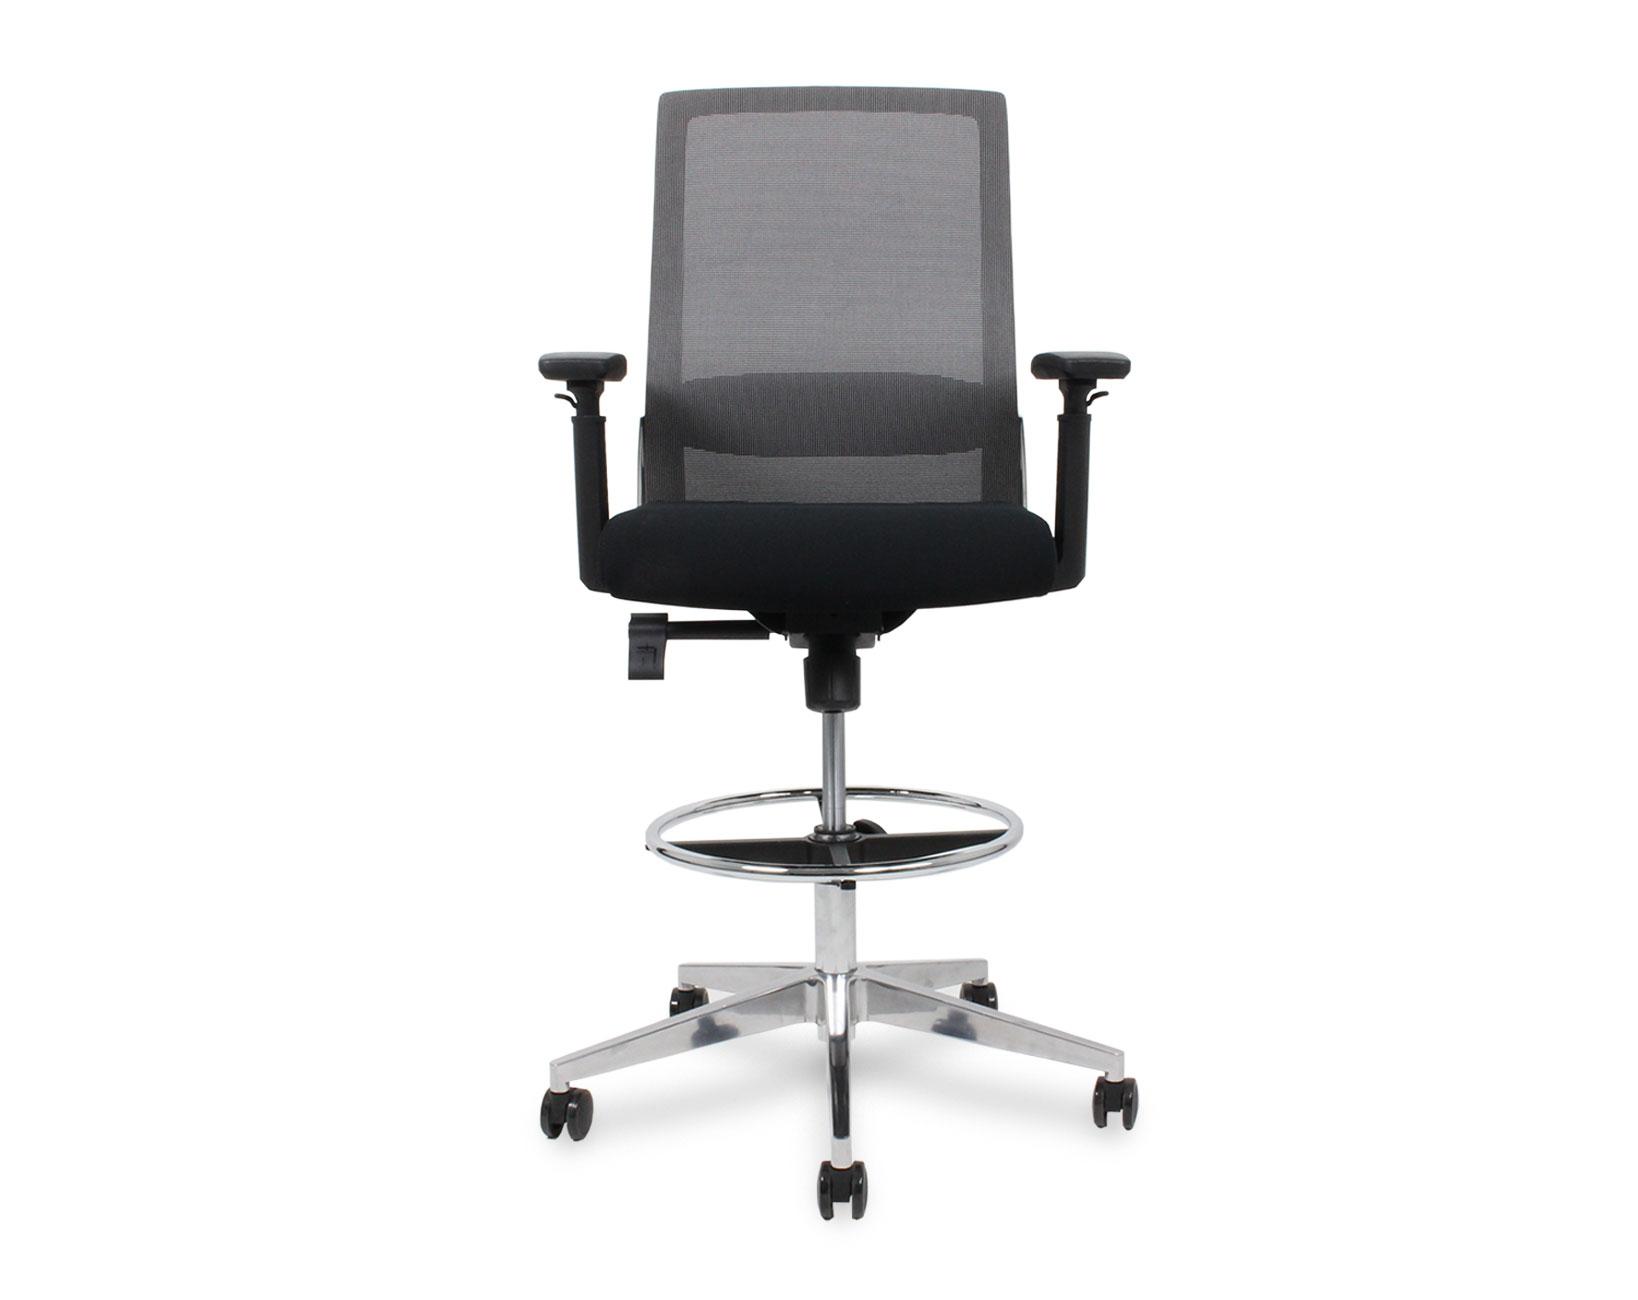 Apex Stool Office Furniture Ethosource